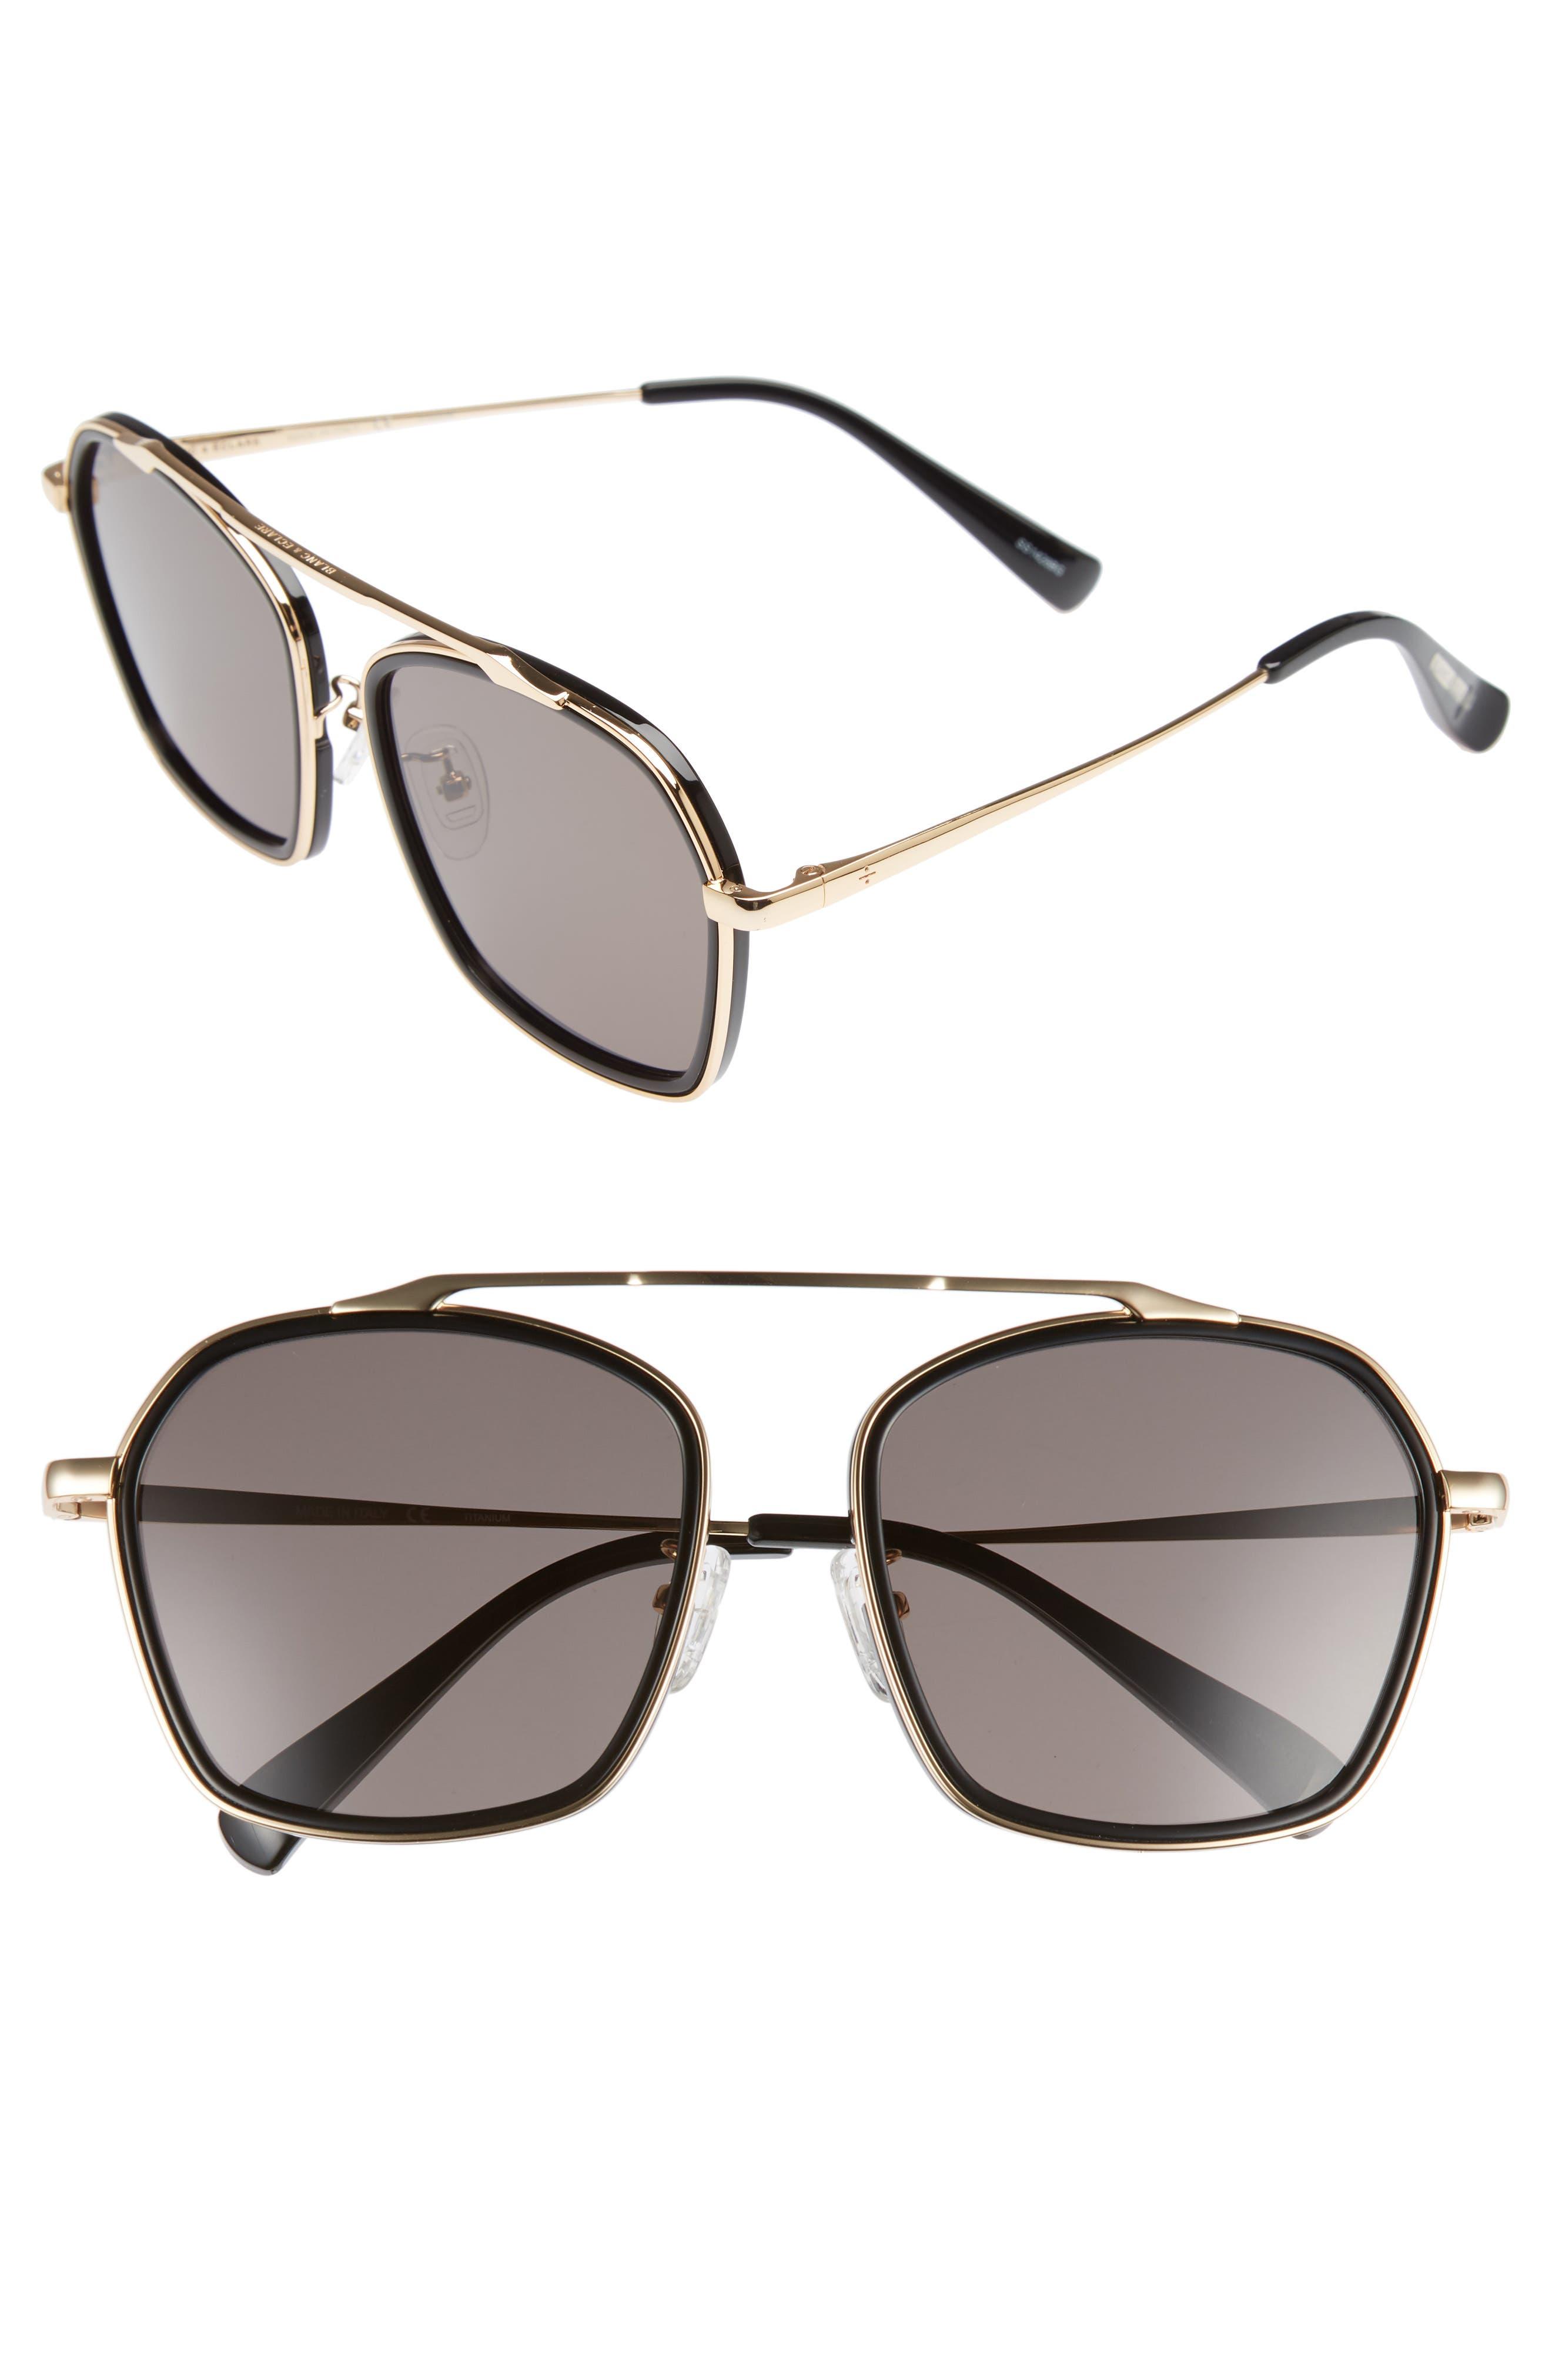 BLANC & ECLARE Vancouver 58mm Polarized Aviator Sunglasses,                         Main,                         color, Black/ Gold/ Smog Grey